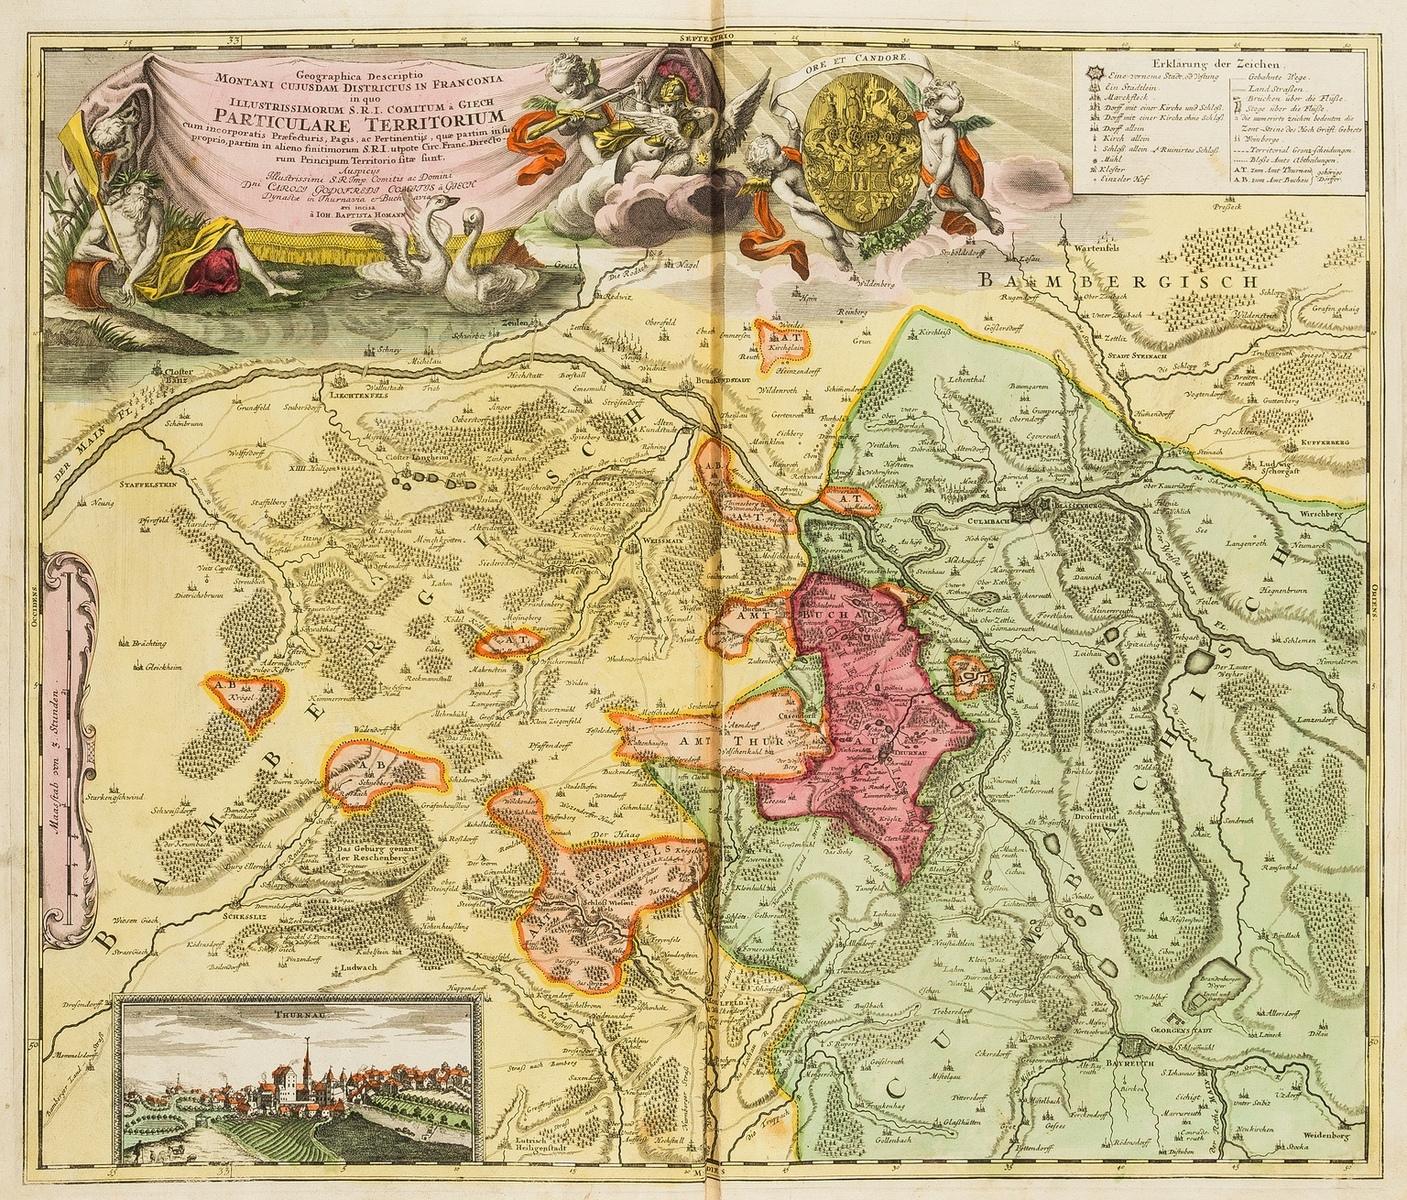 Germany.- Homann (Johann Baptist) Six regional maps of Germany, Denmark, and Austria, [c. 1740].